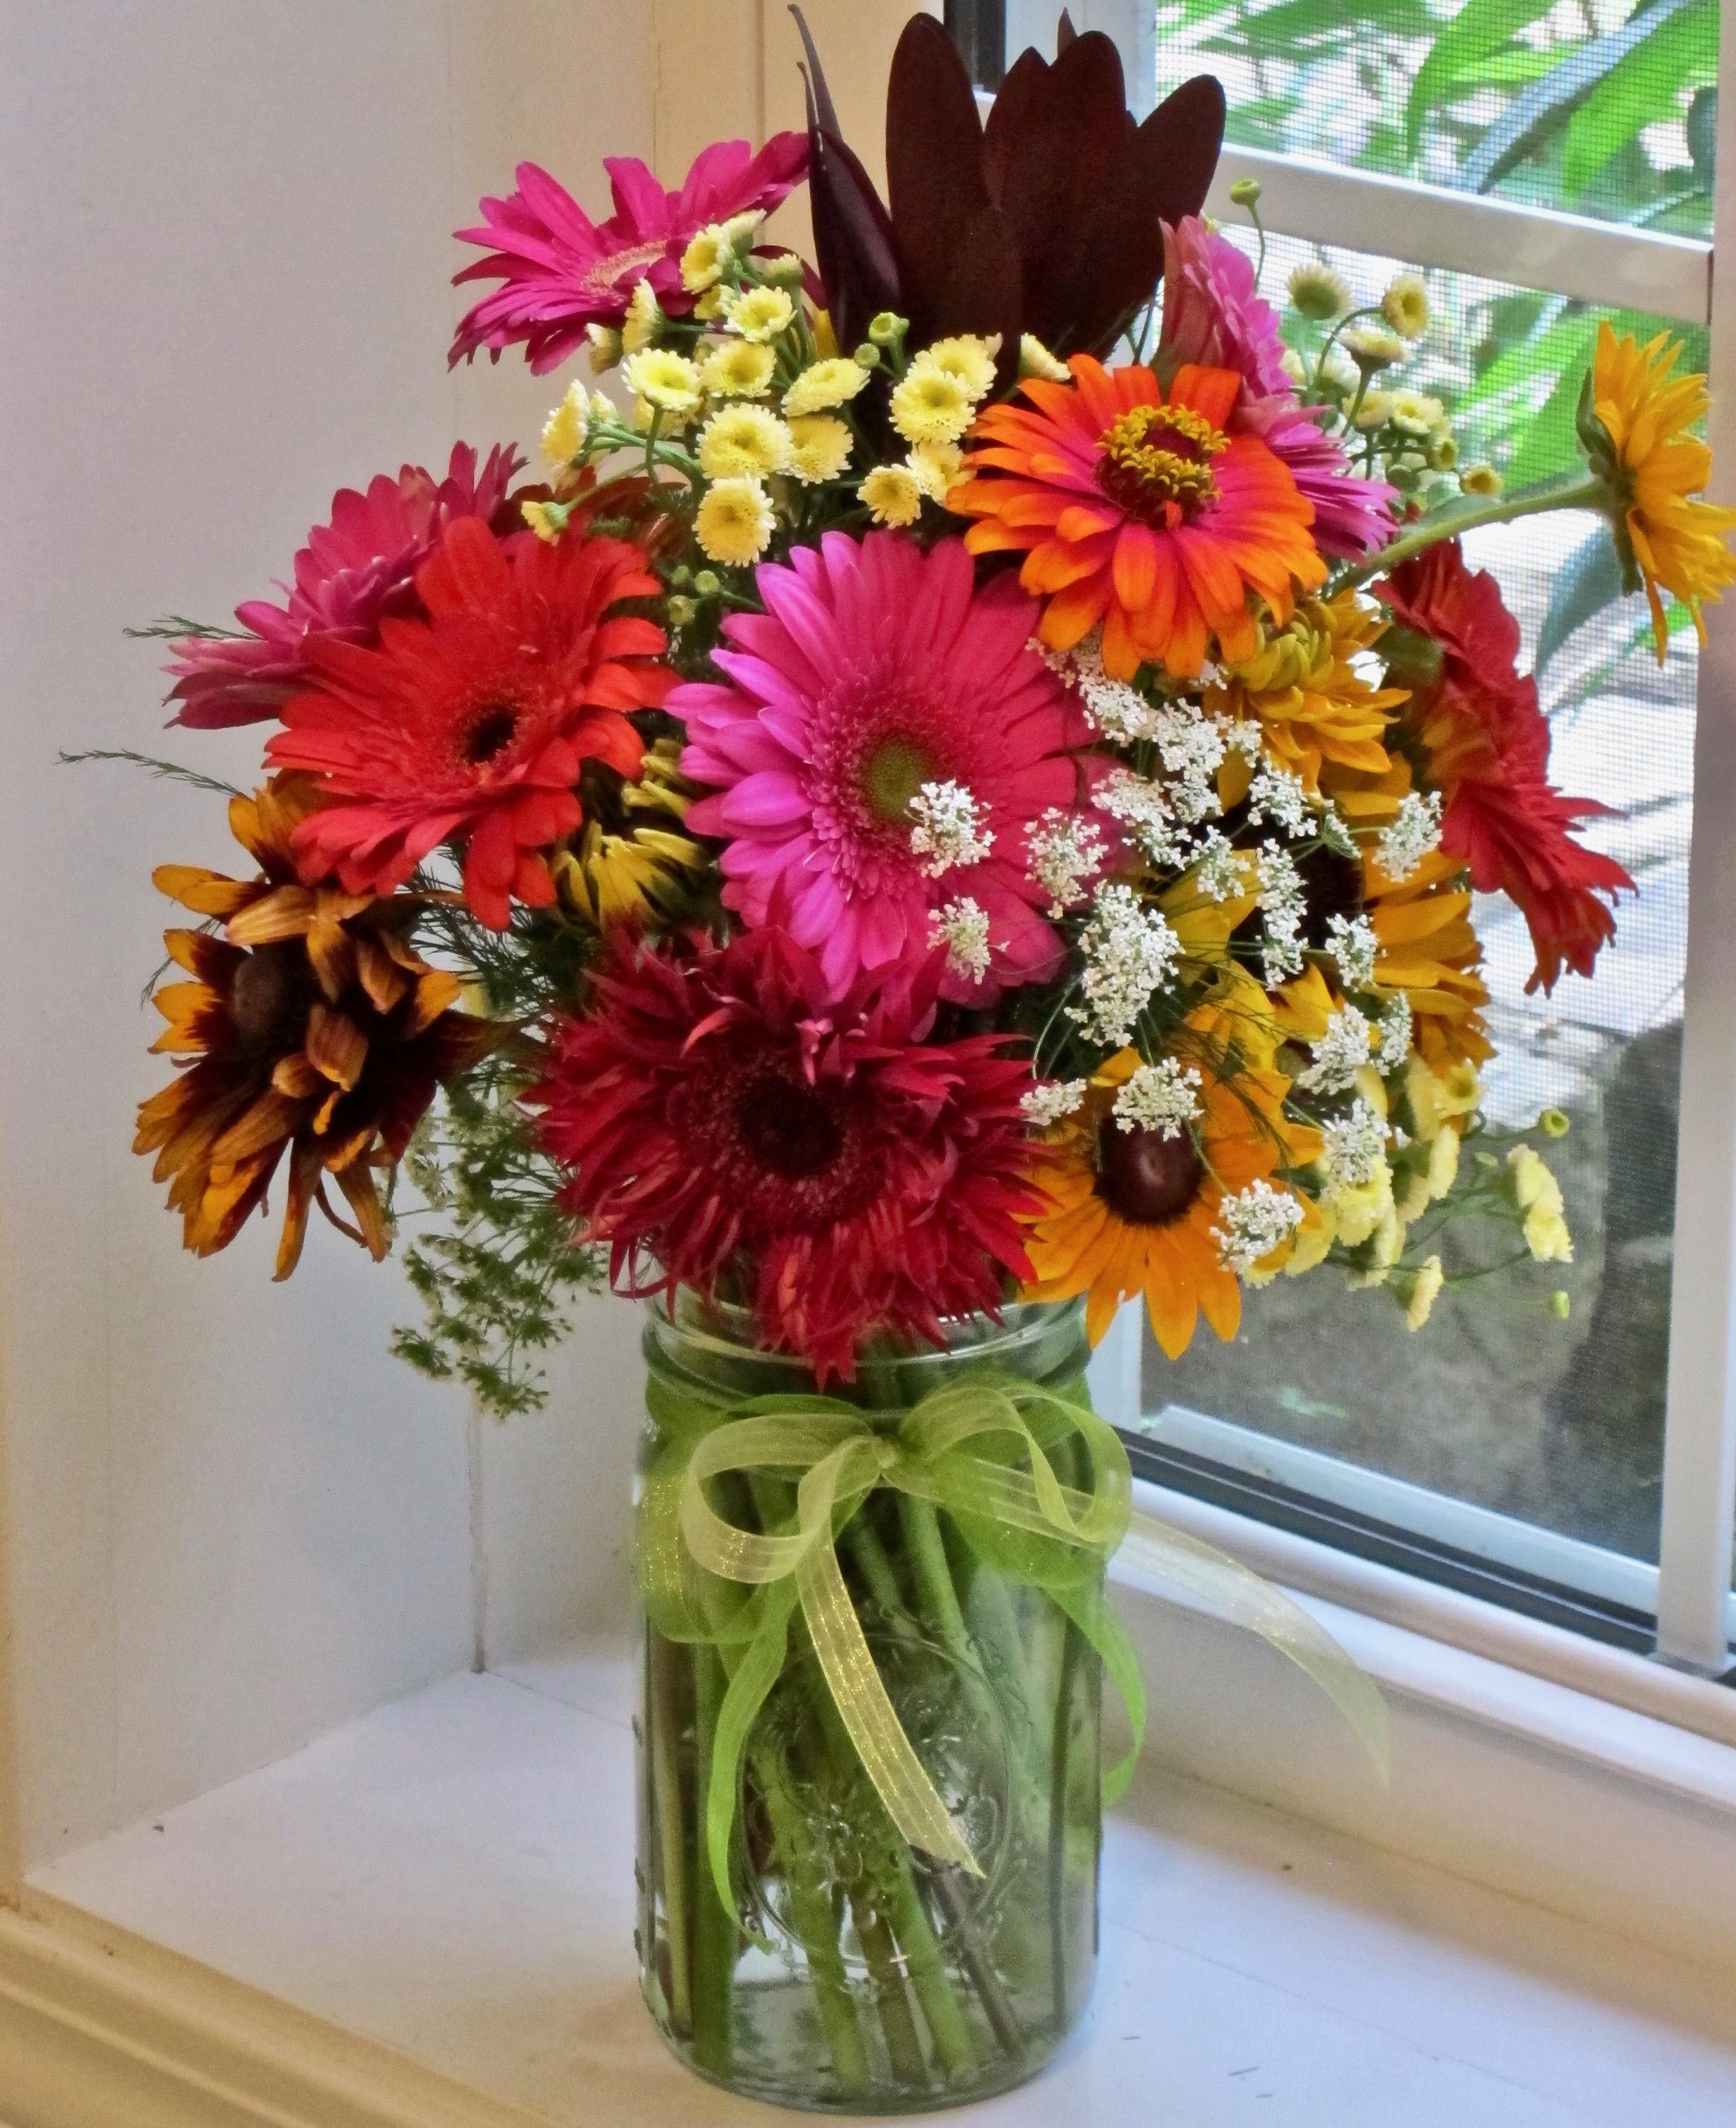 DAISY MEDLEY MASON JAR   of colorful seasonal asters such as gerbera daisies, rudebeckia, sunflowers, fever few, mums, $45.